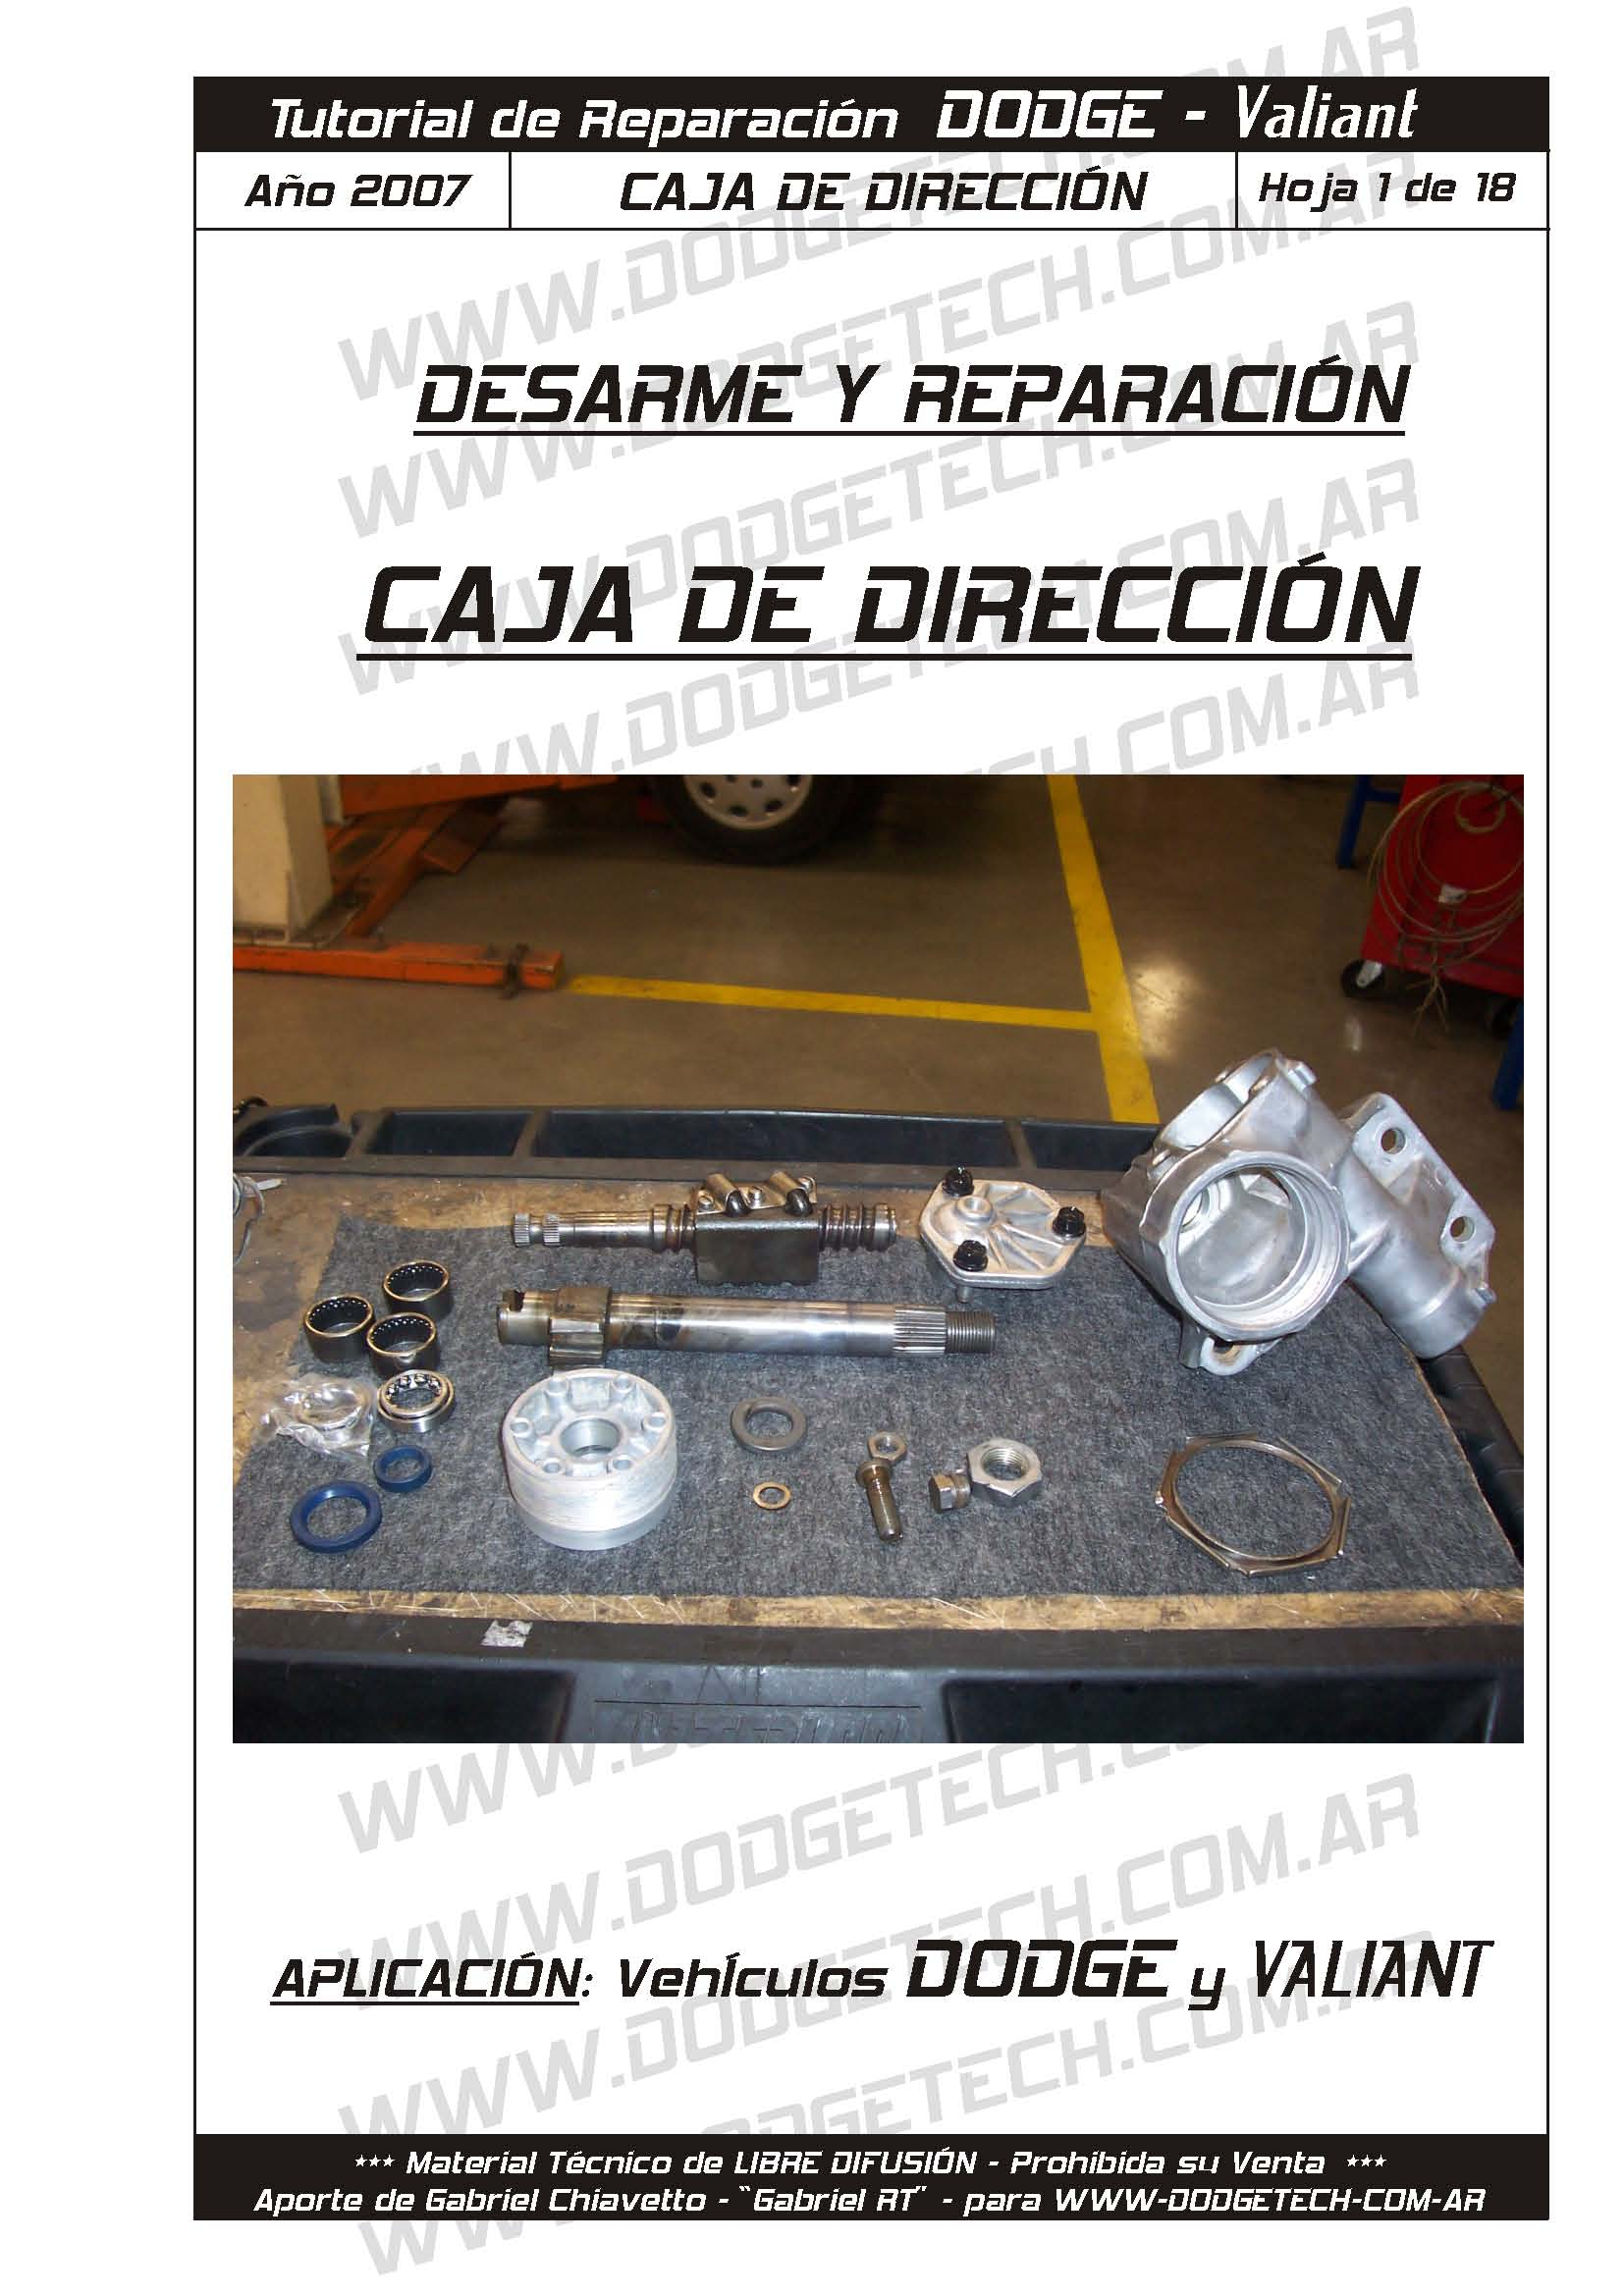 86649_CajaDeDirecci7n_Page_01_122_830lo.jpg